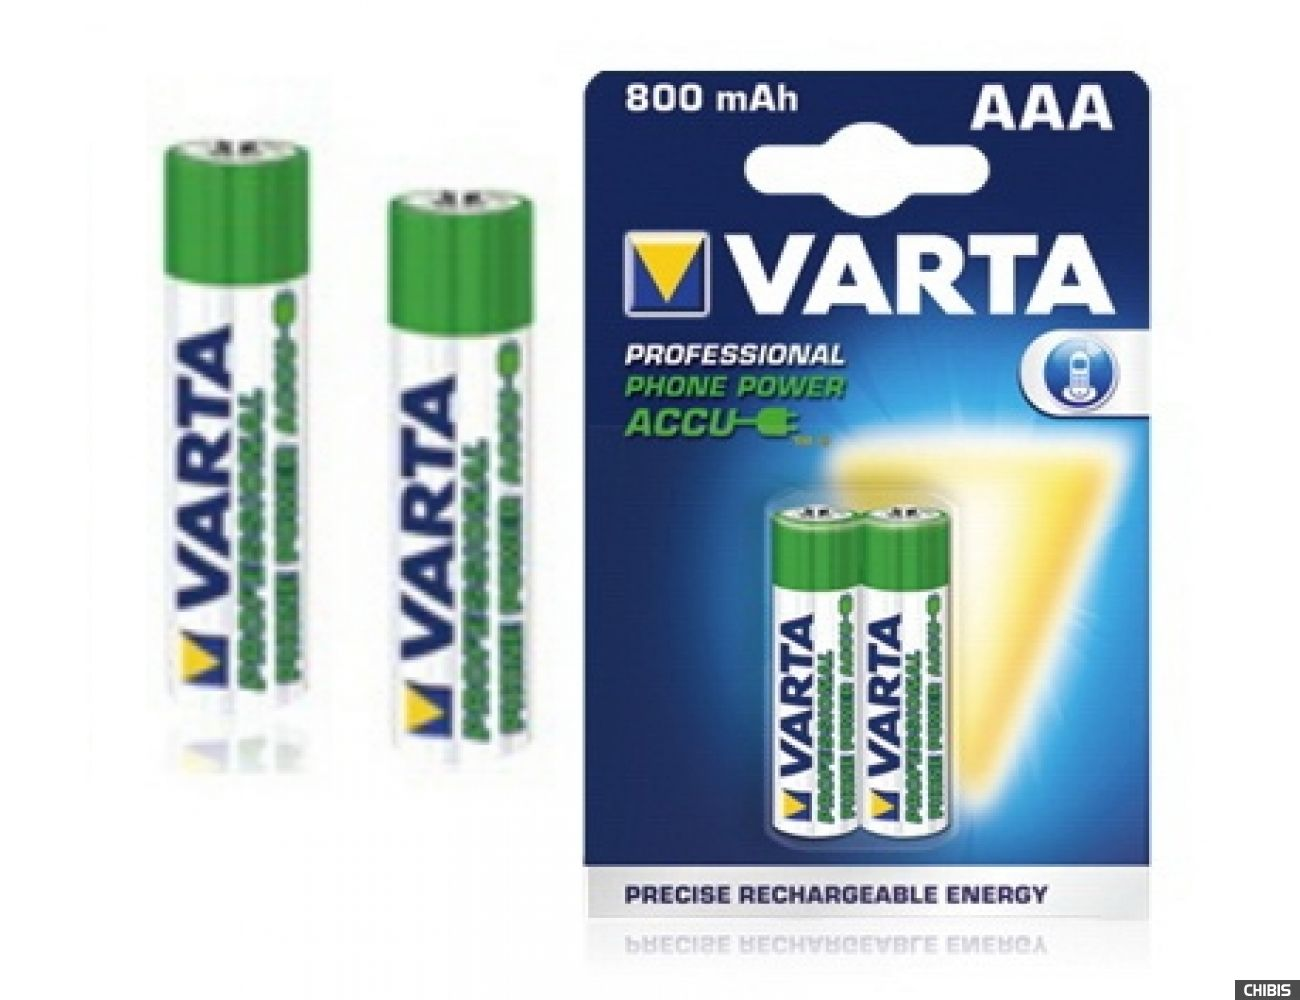 Аккумуляторные батарейки ААА Varta 800 mAh Professional Phone Power (HR03, 800 mAh, 1.2V, Ni-Mh)  58398101402